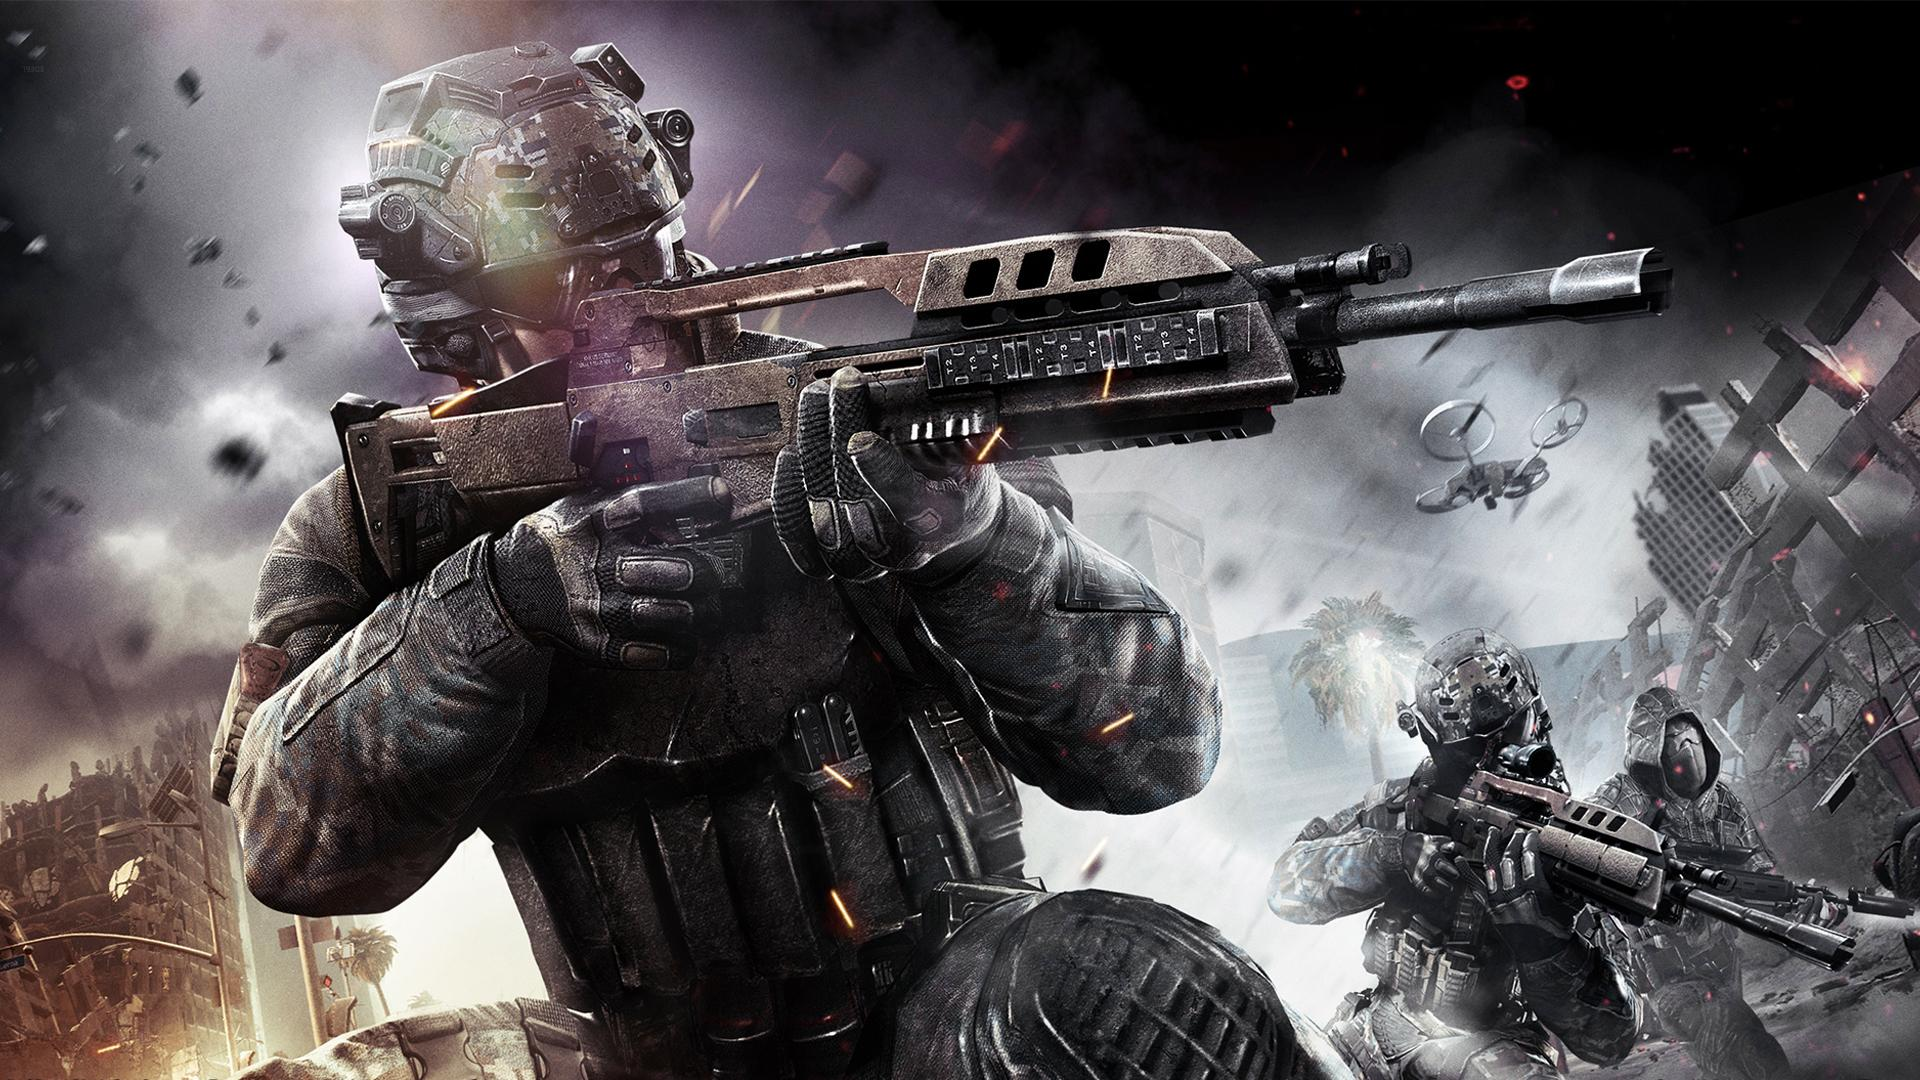 Download Black Ops 2 Video Game wallpaper 1920x1080 1080p hd wallpaper 1920x1080